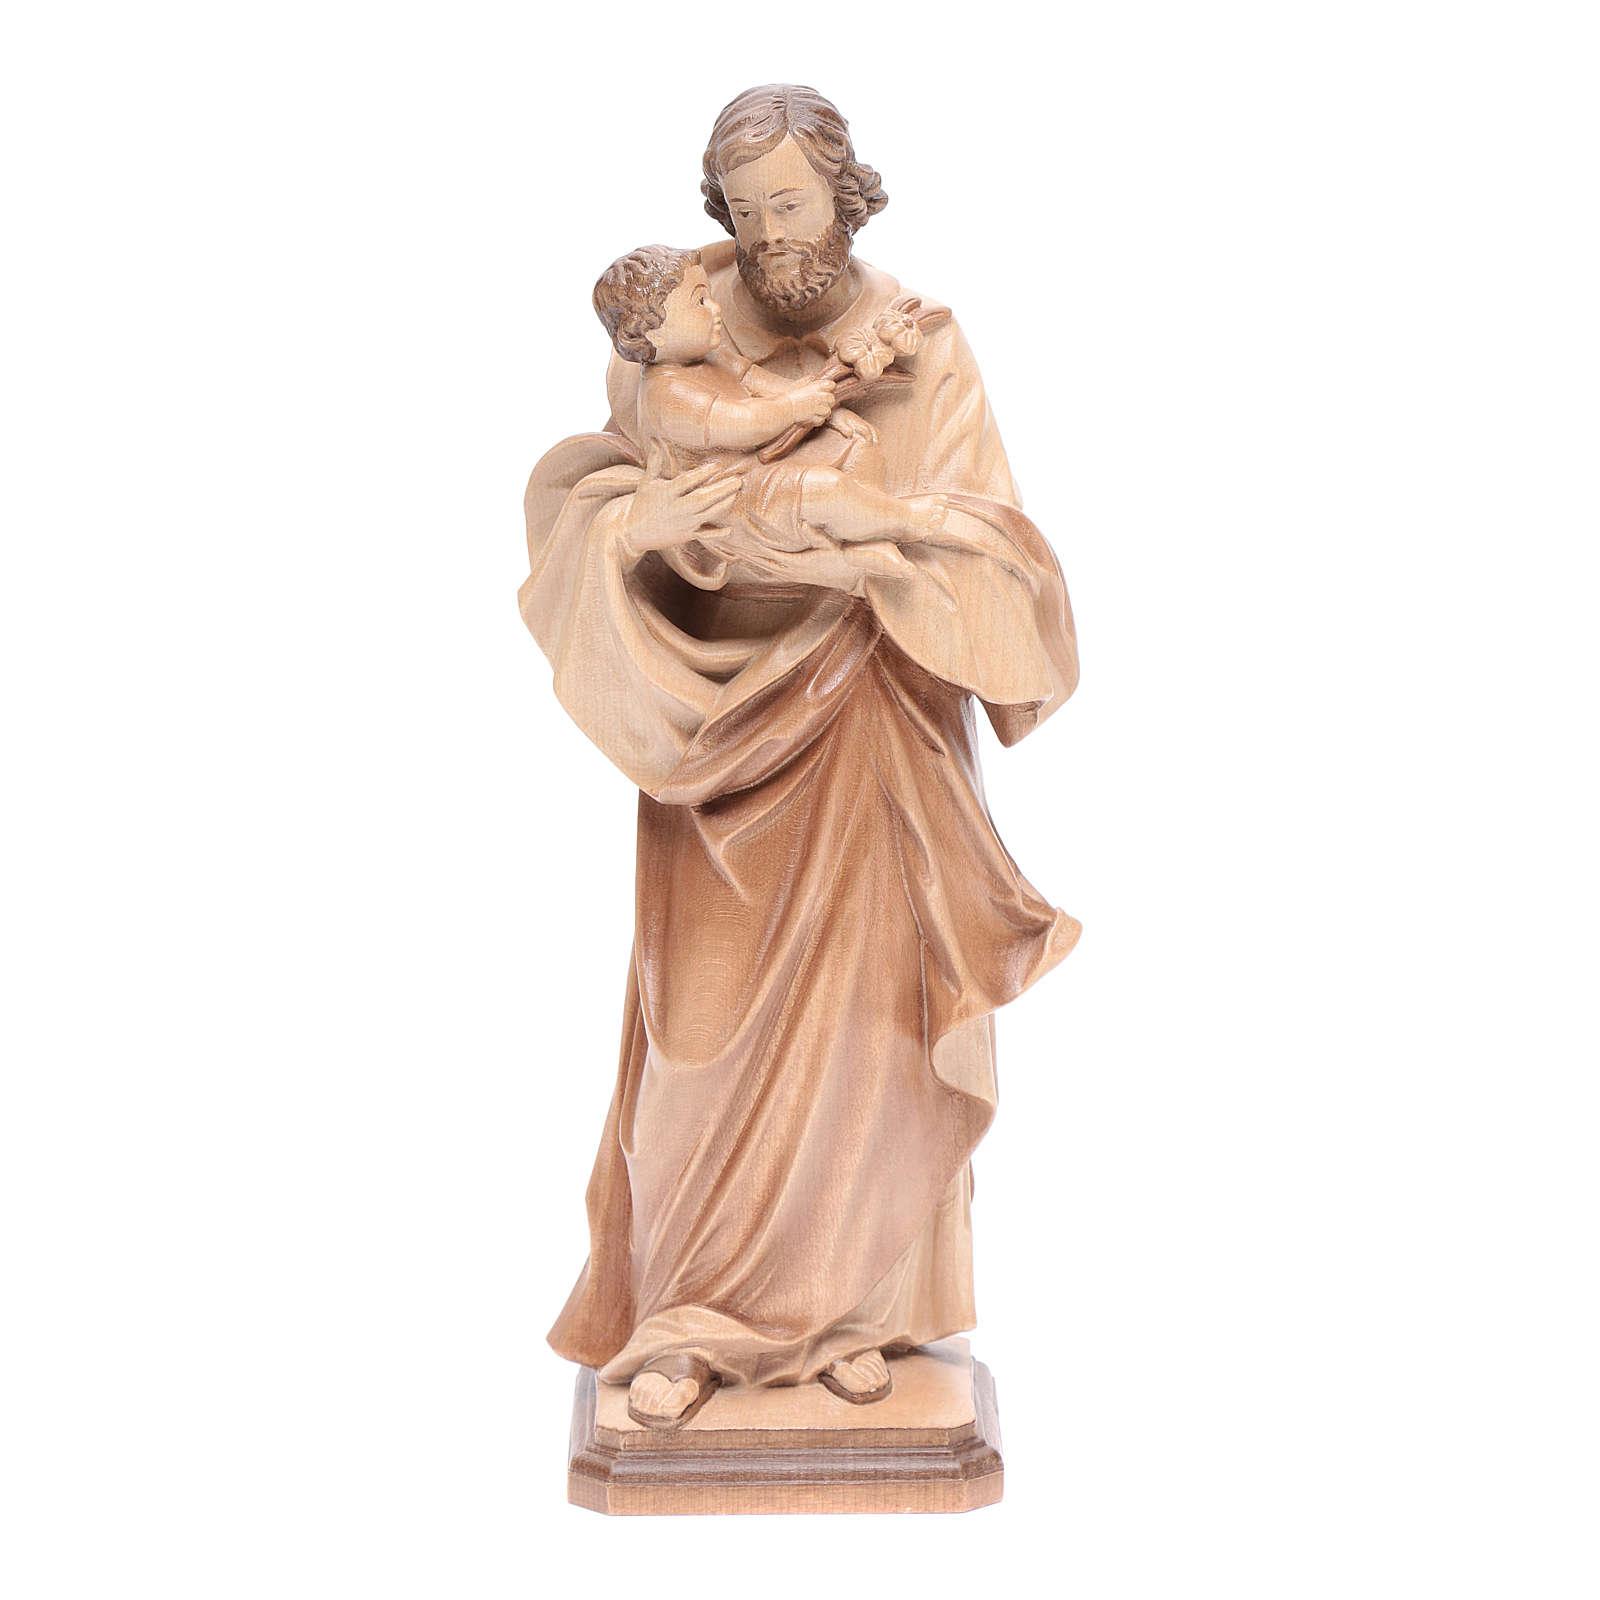 Guido Reni's Saint Joseph in multi-patinated Valgardena wood 4